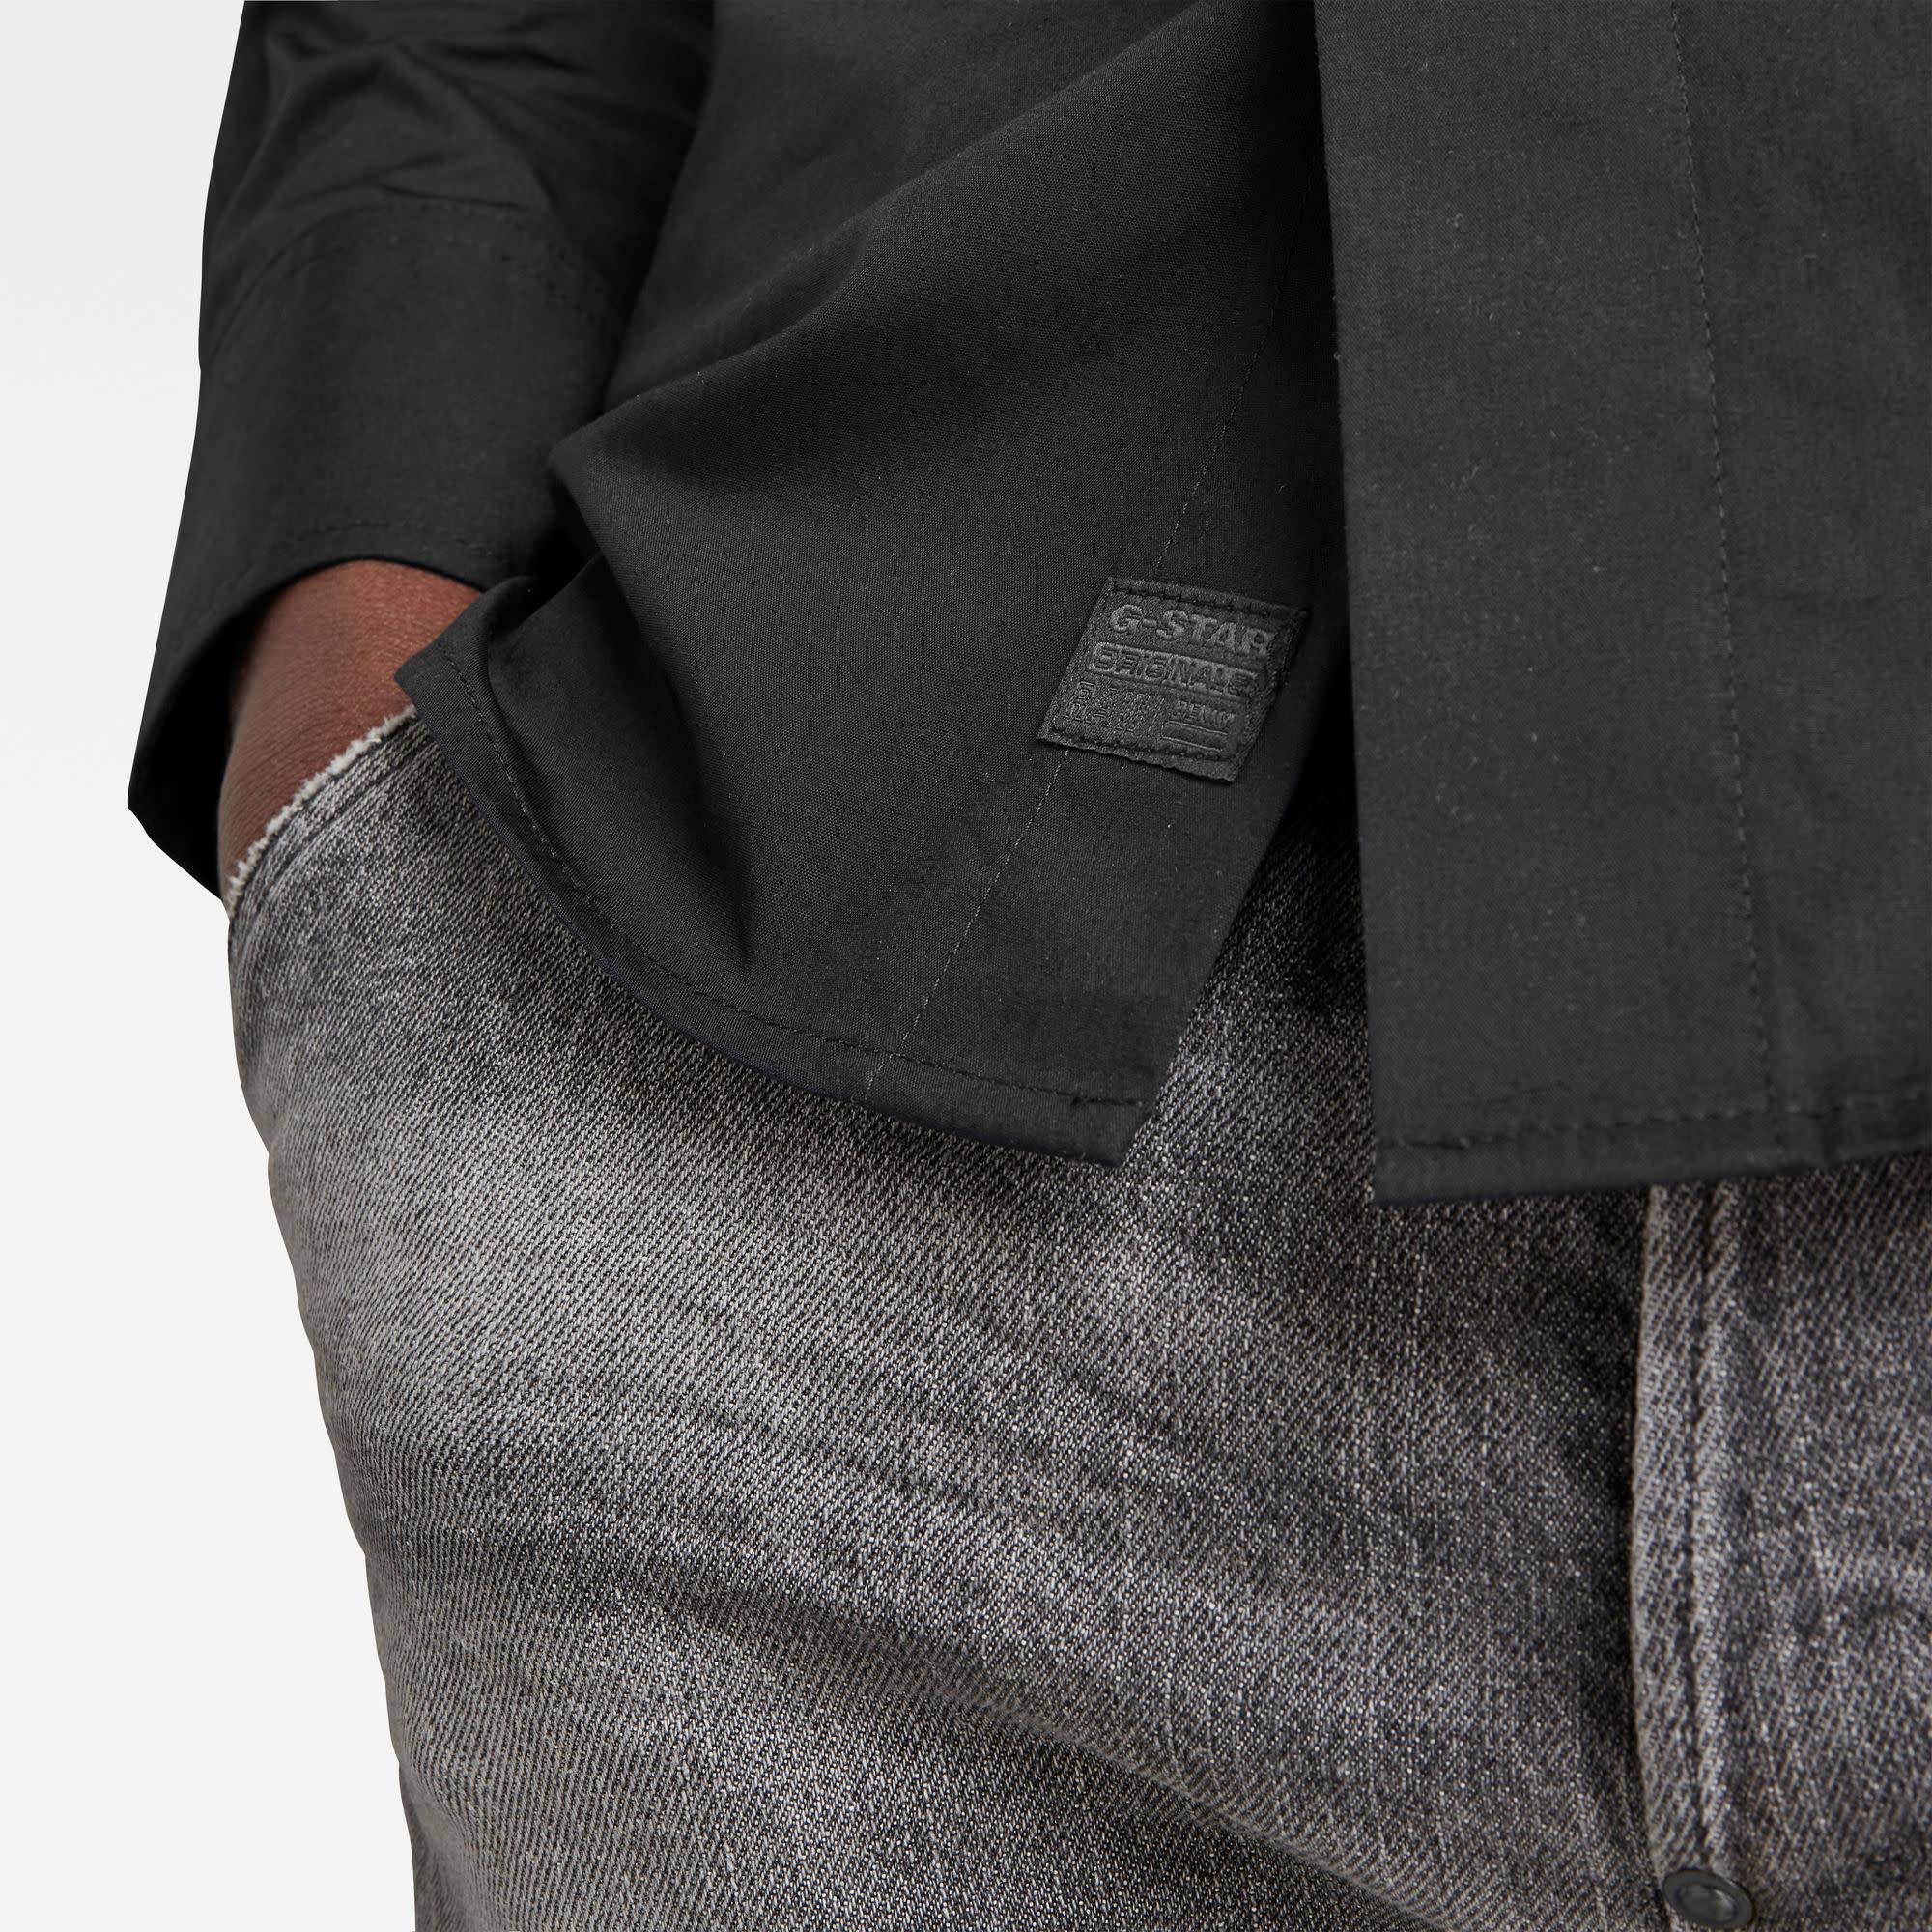 G-Star G-Star Core Super Slim Shirt L/S Black